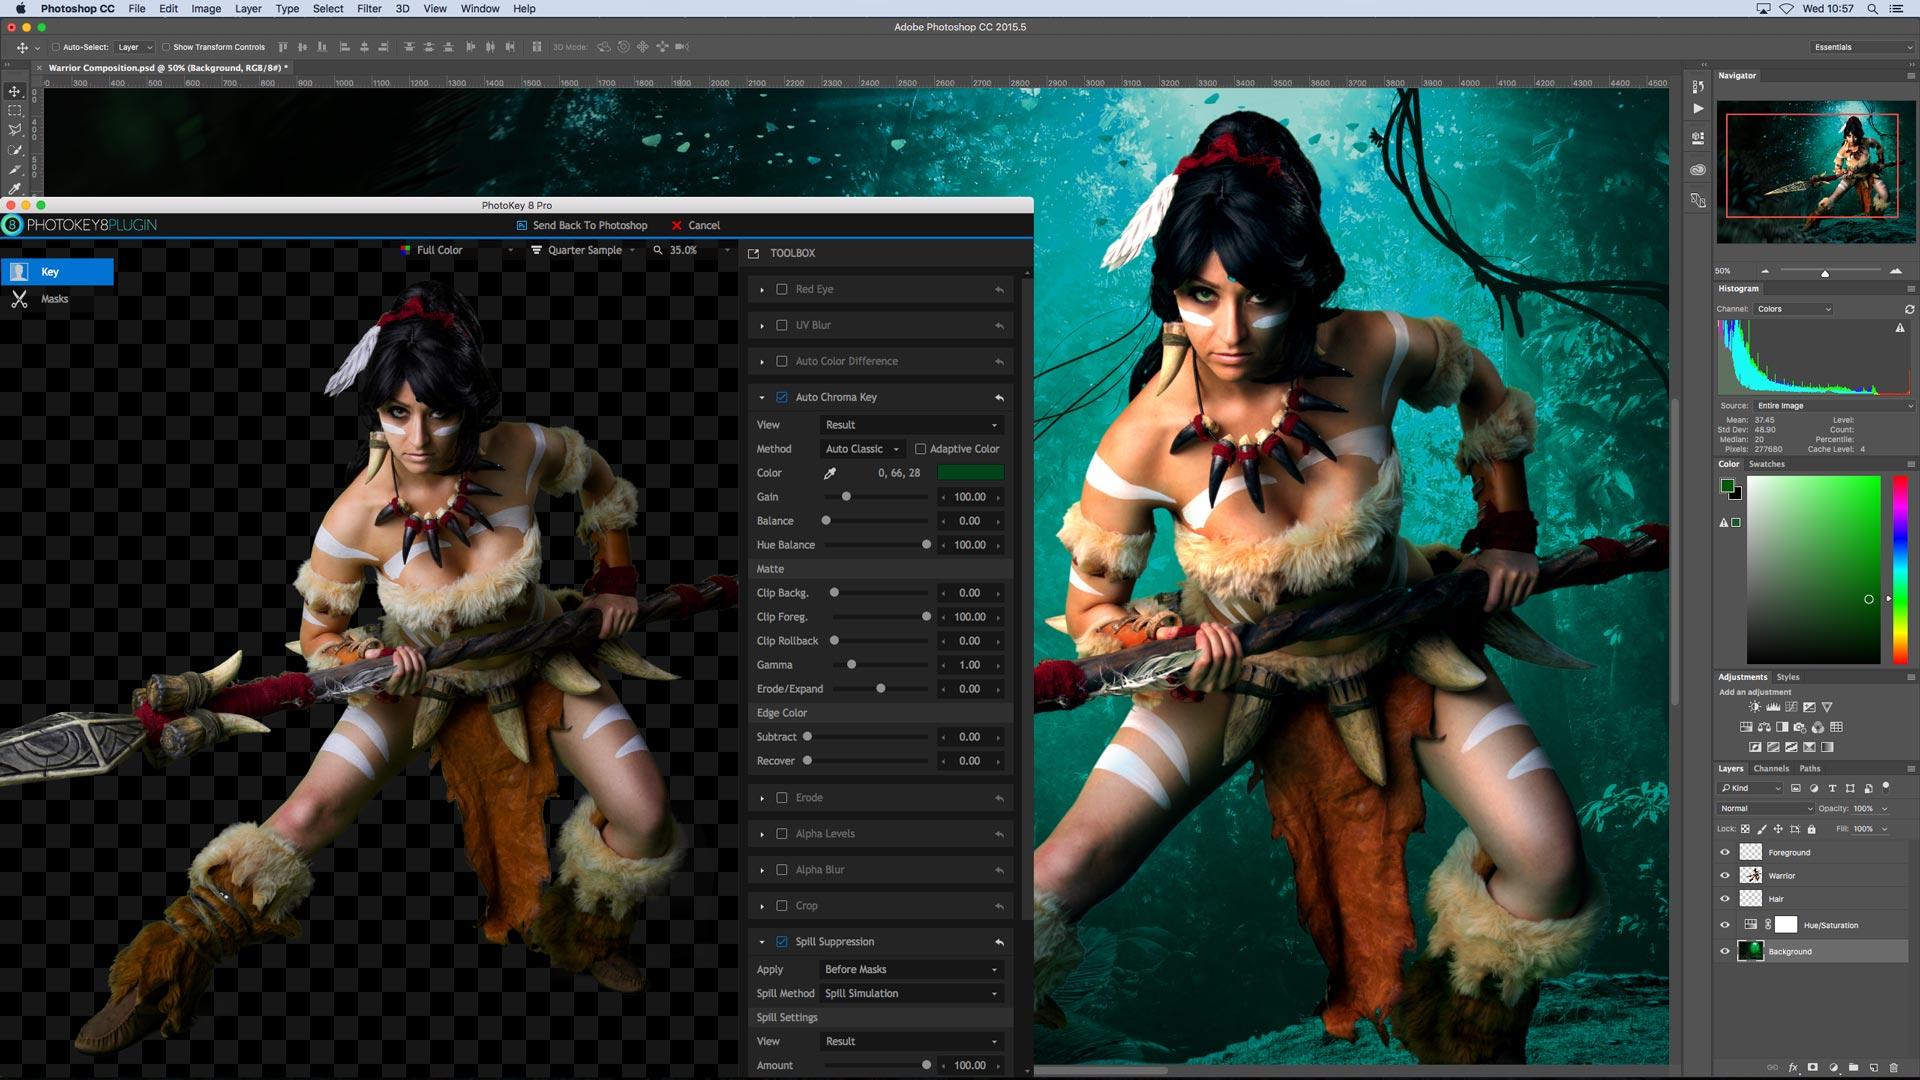 Interface screenshot of the PhotoKey 8 Pro plugin in Adobe Photoshop CC